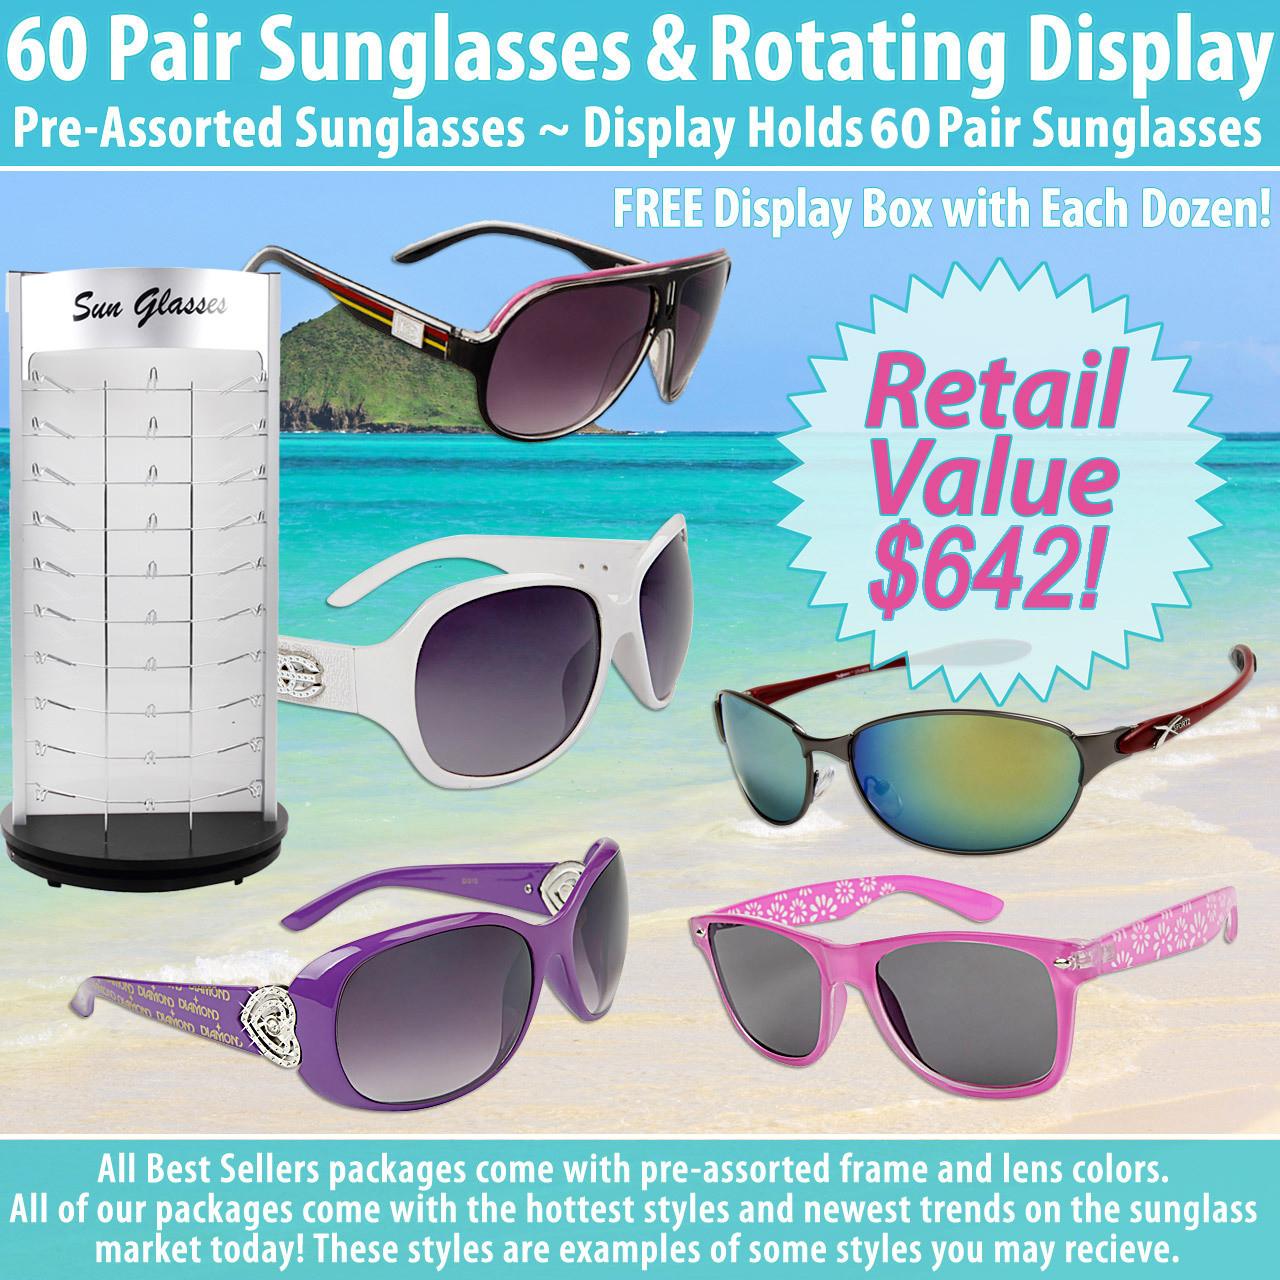 60 Pair Sunglasses & Rotating Display Package Deal